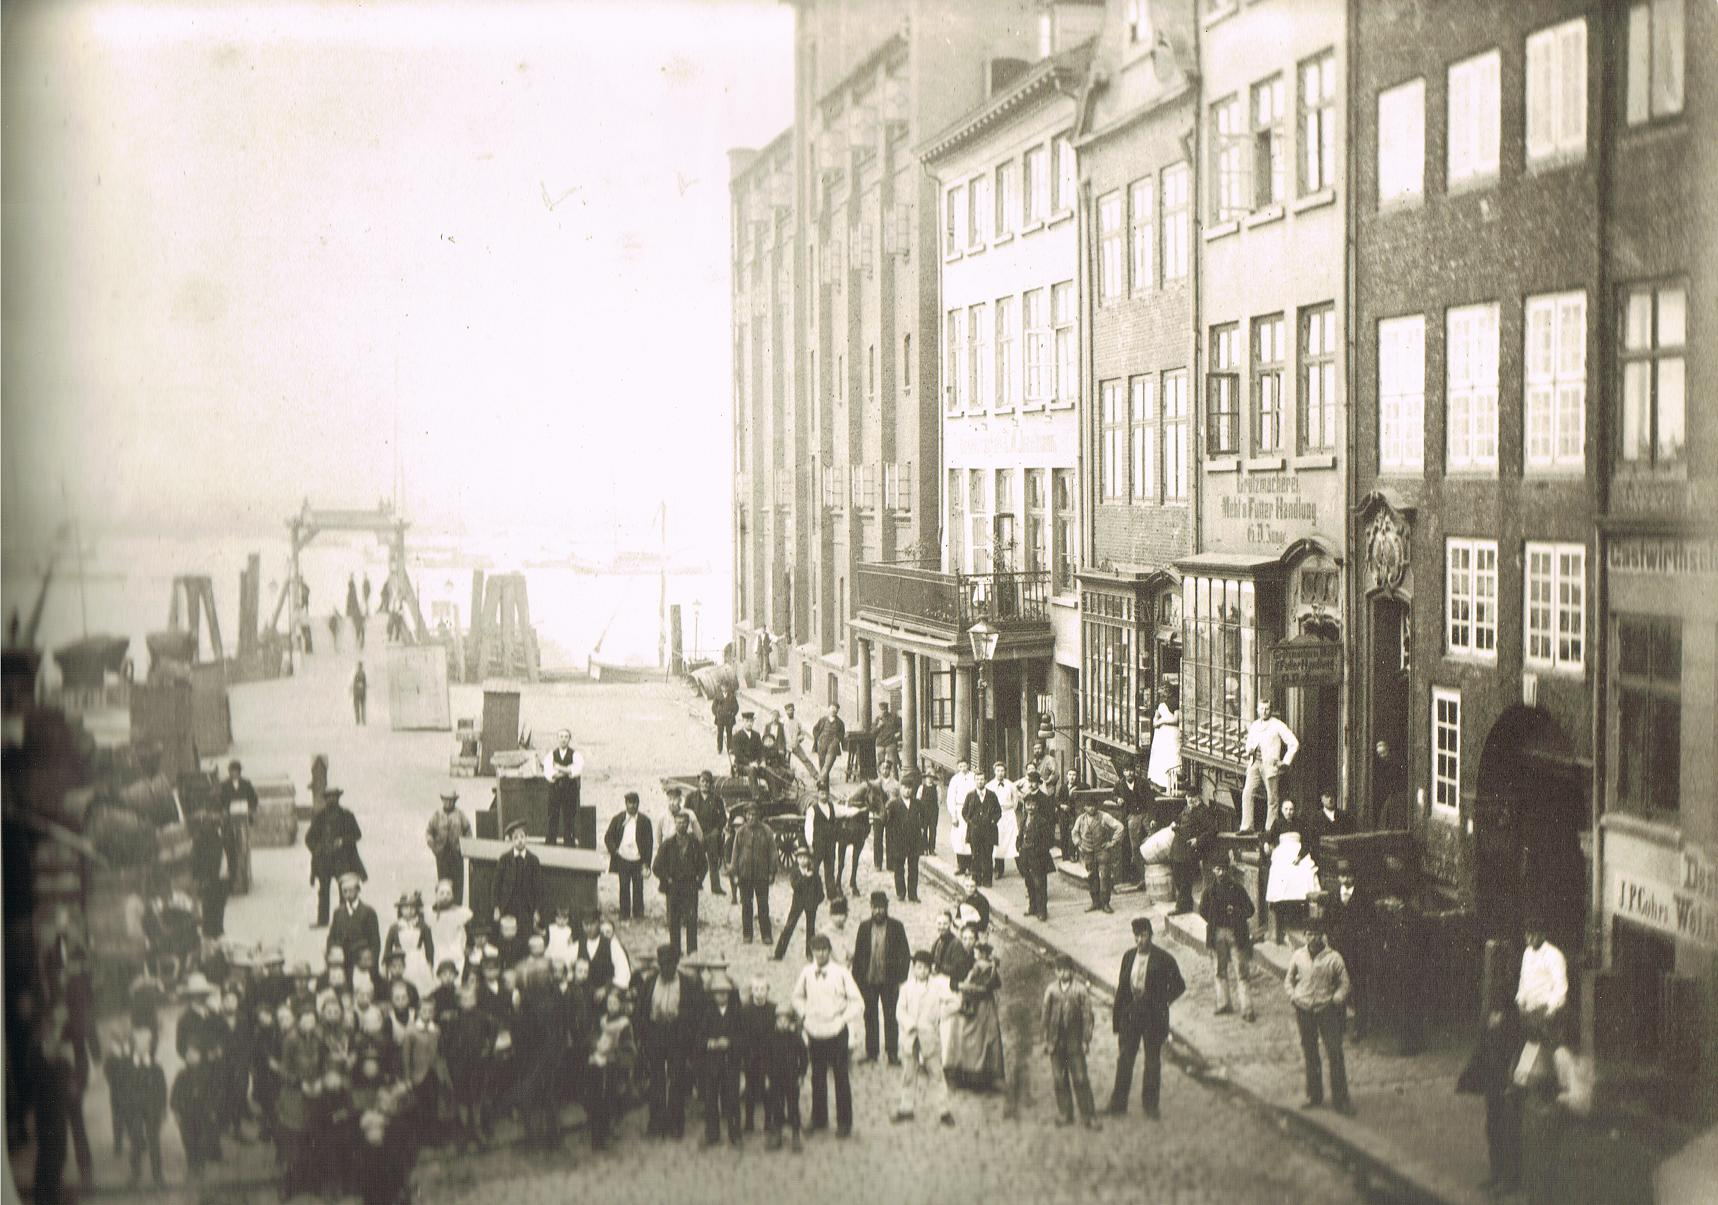 File:Altonaer Fischmarkt, G. Weber, 1858.jpg